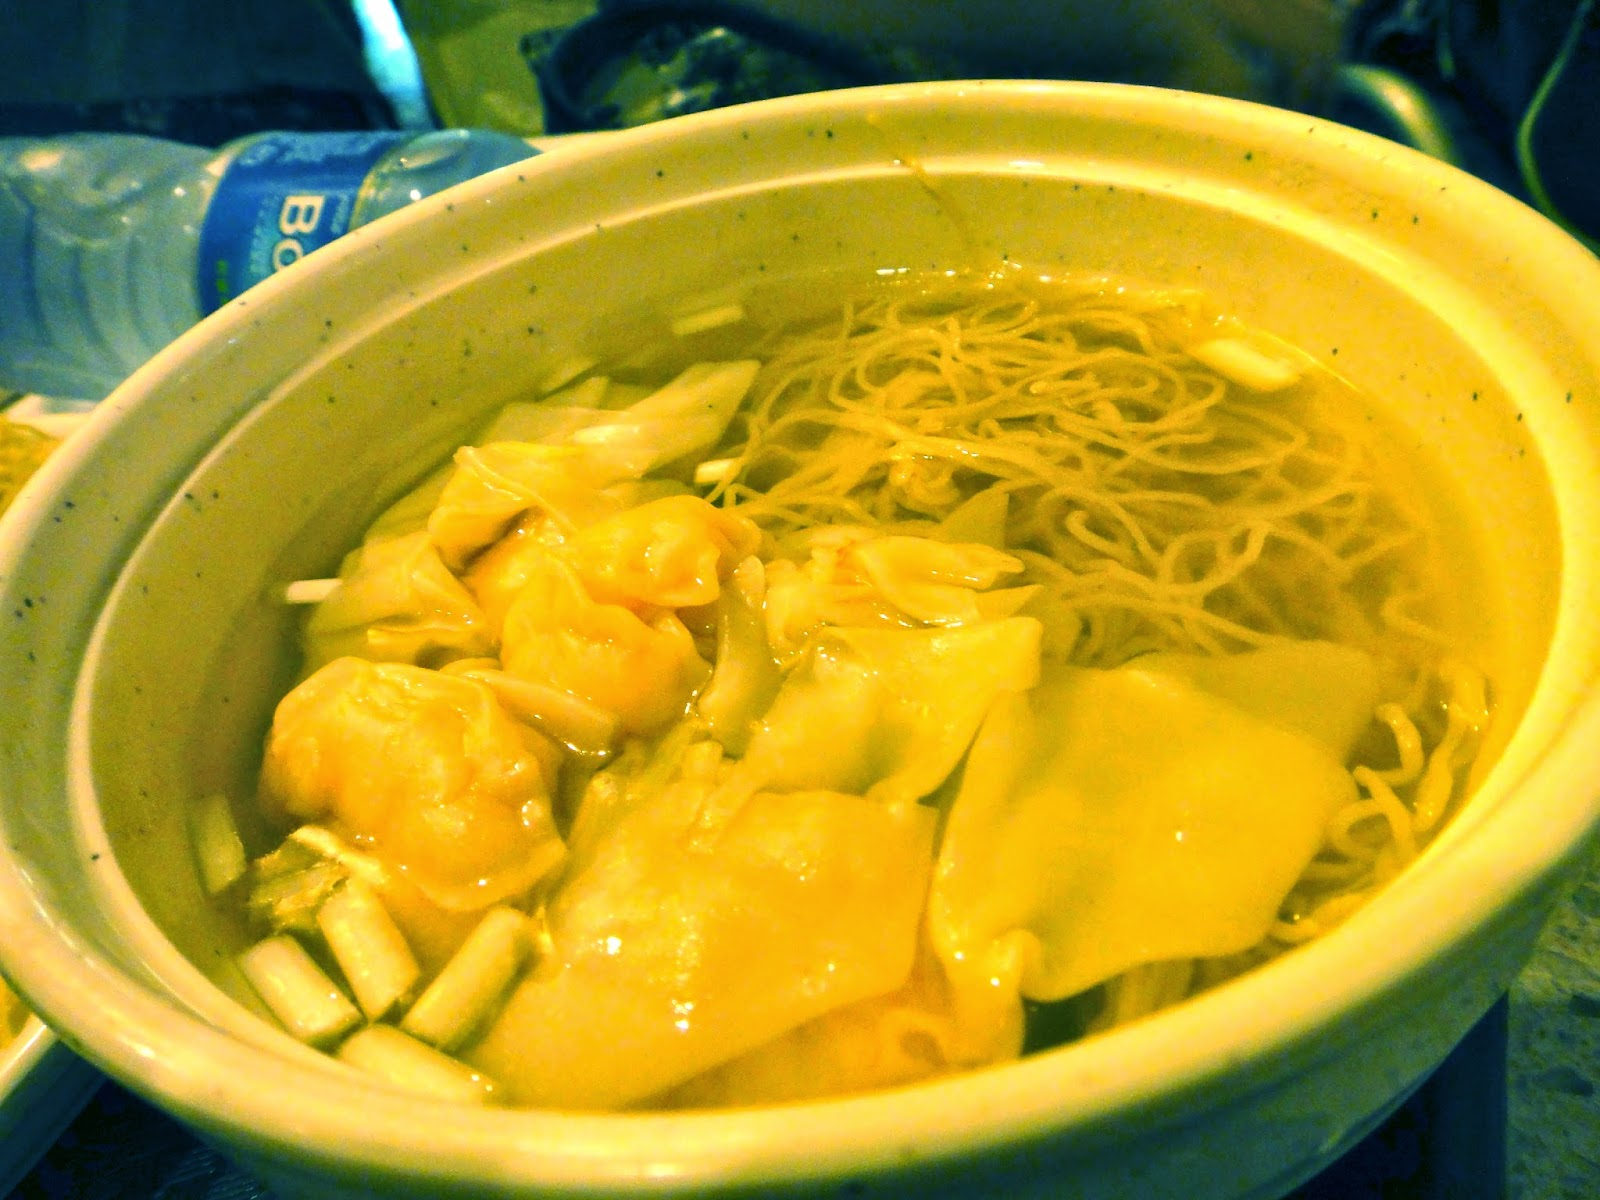 Prawn wantons soup noodle the Venetian food court Macao